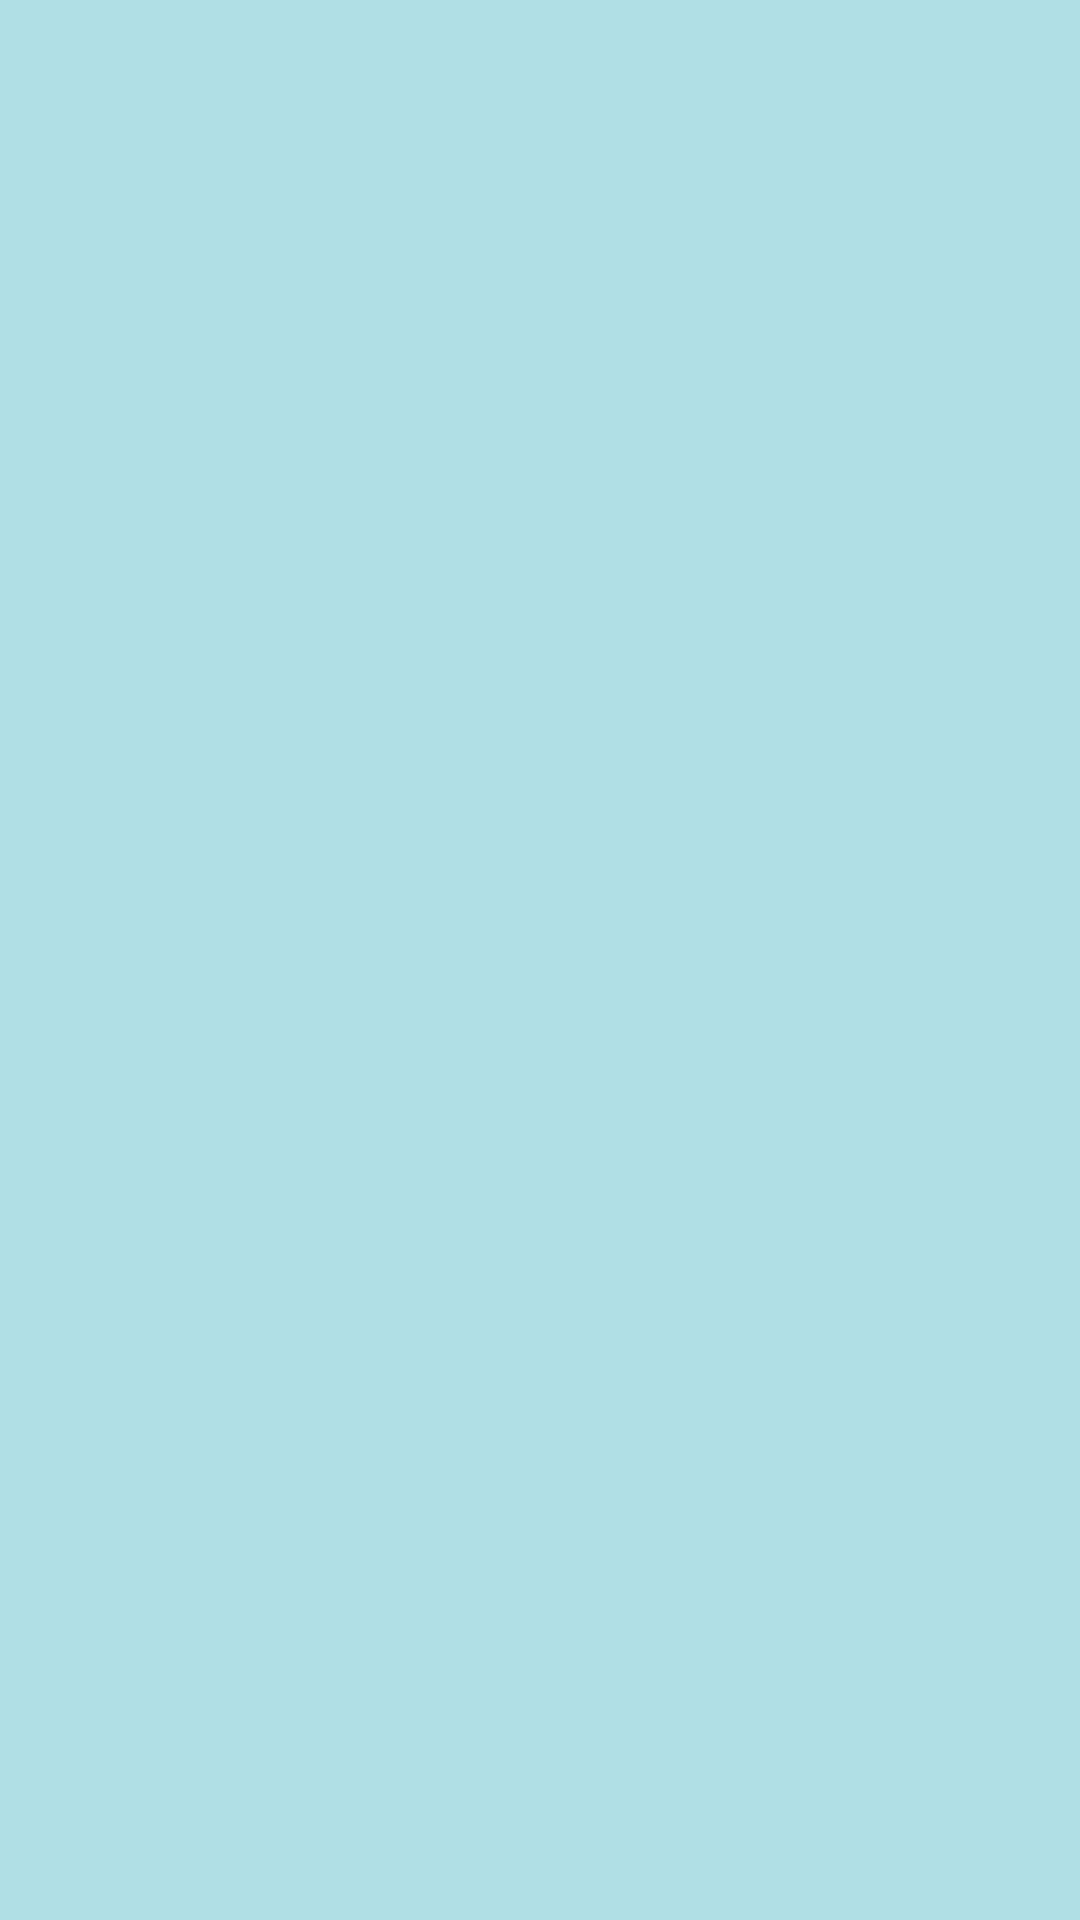 1080x1920 Powder Blue Web Solid Color Background